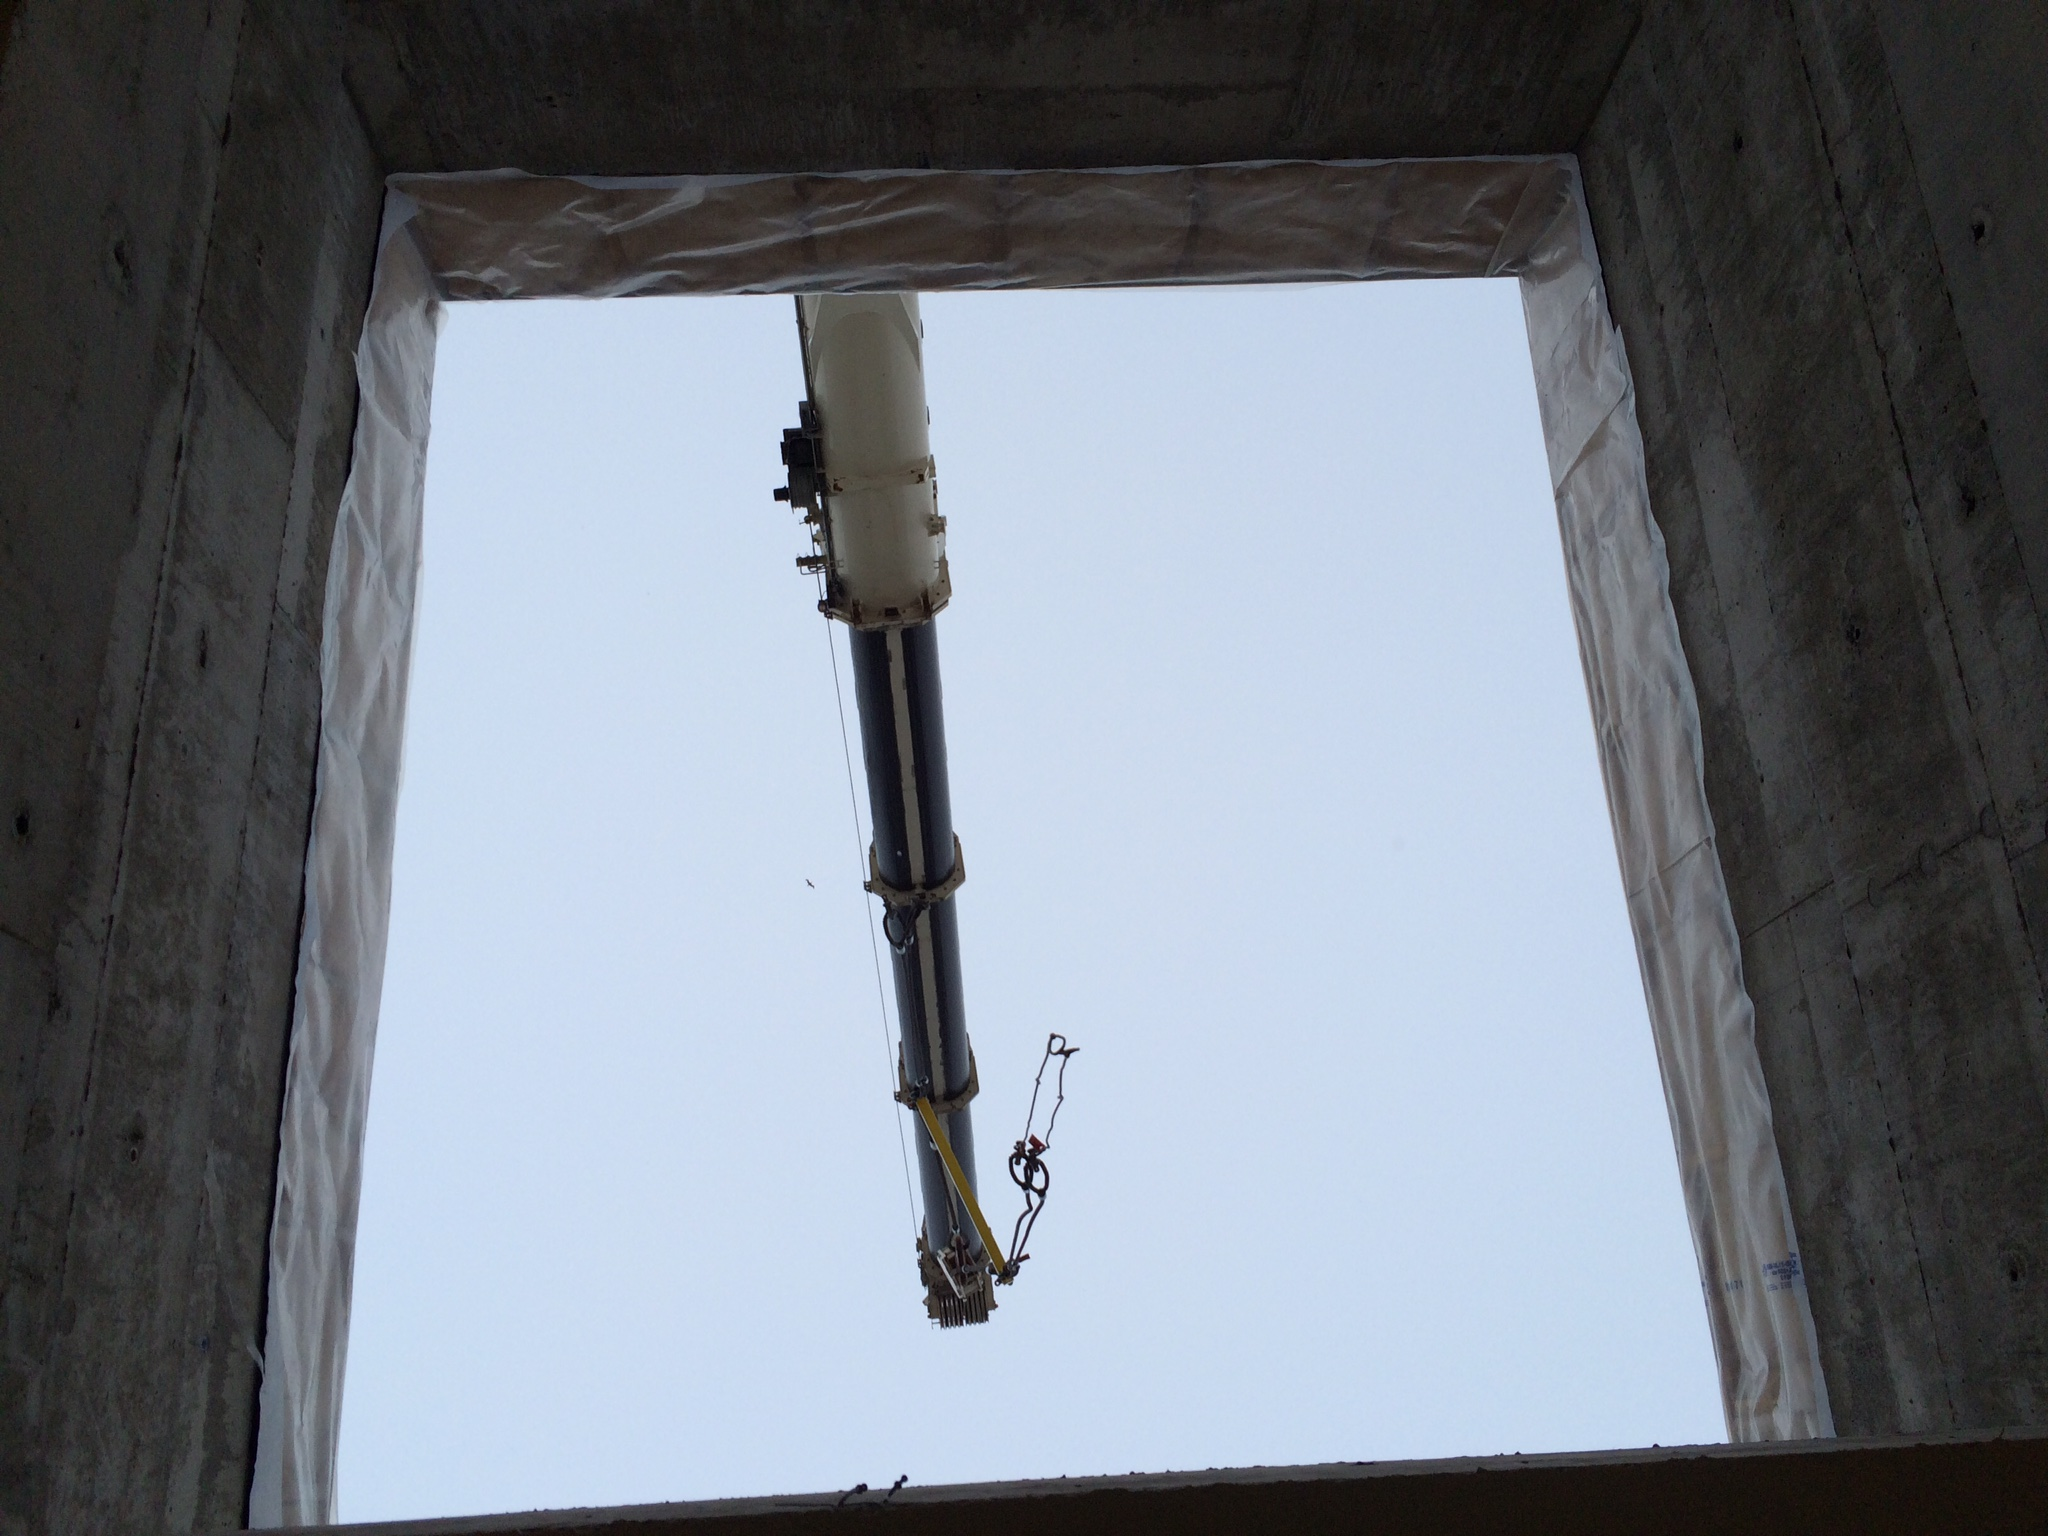 View through ceiling hole